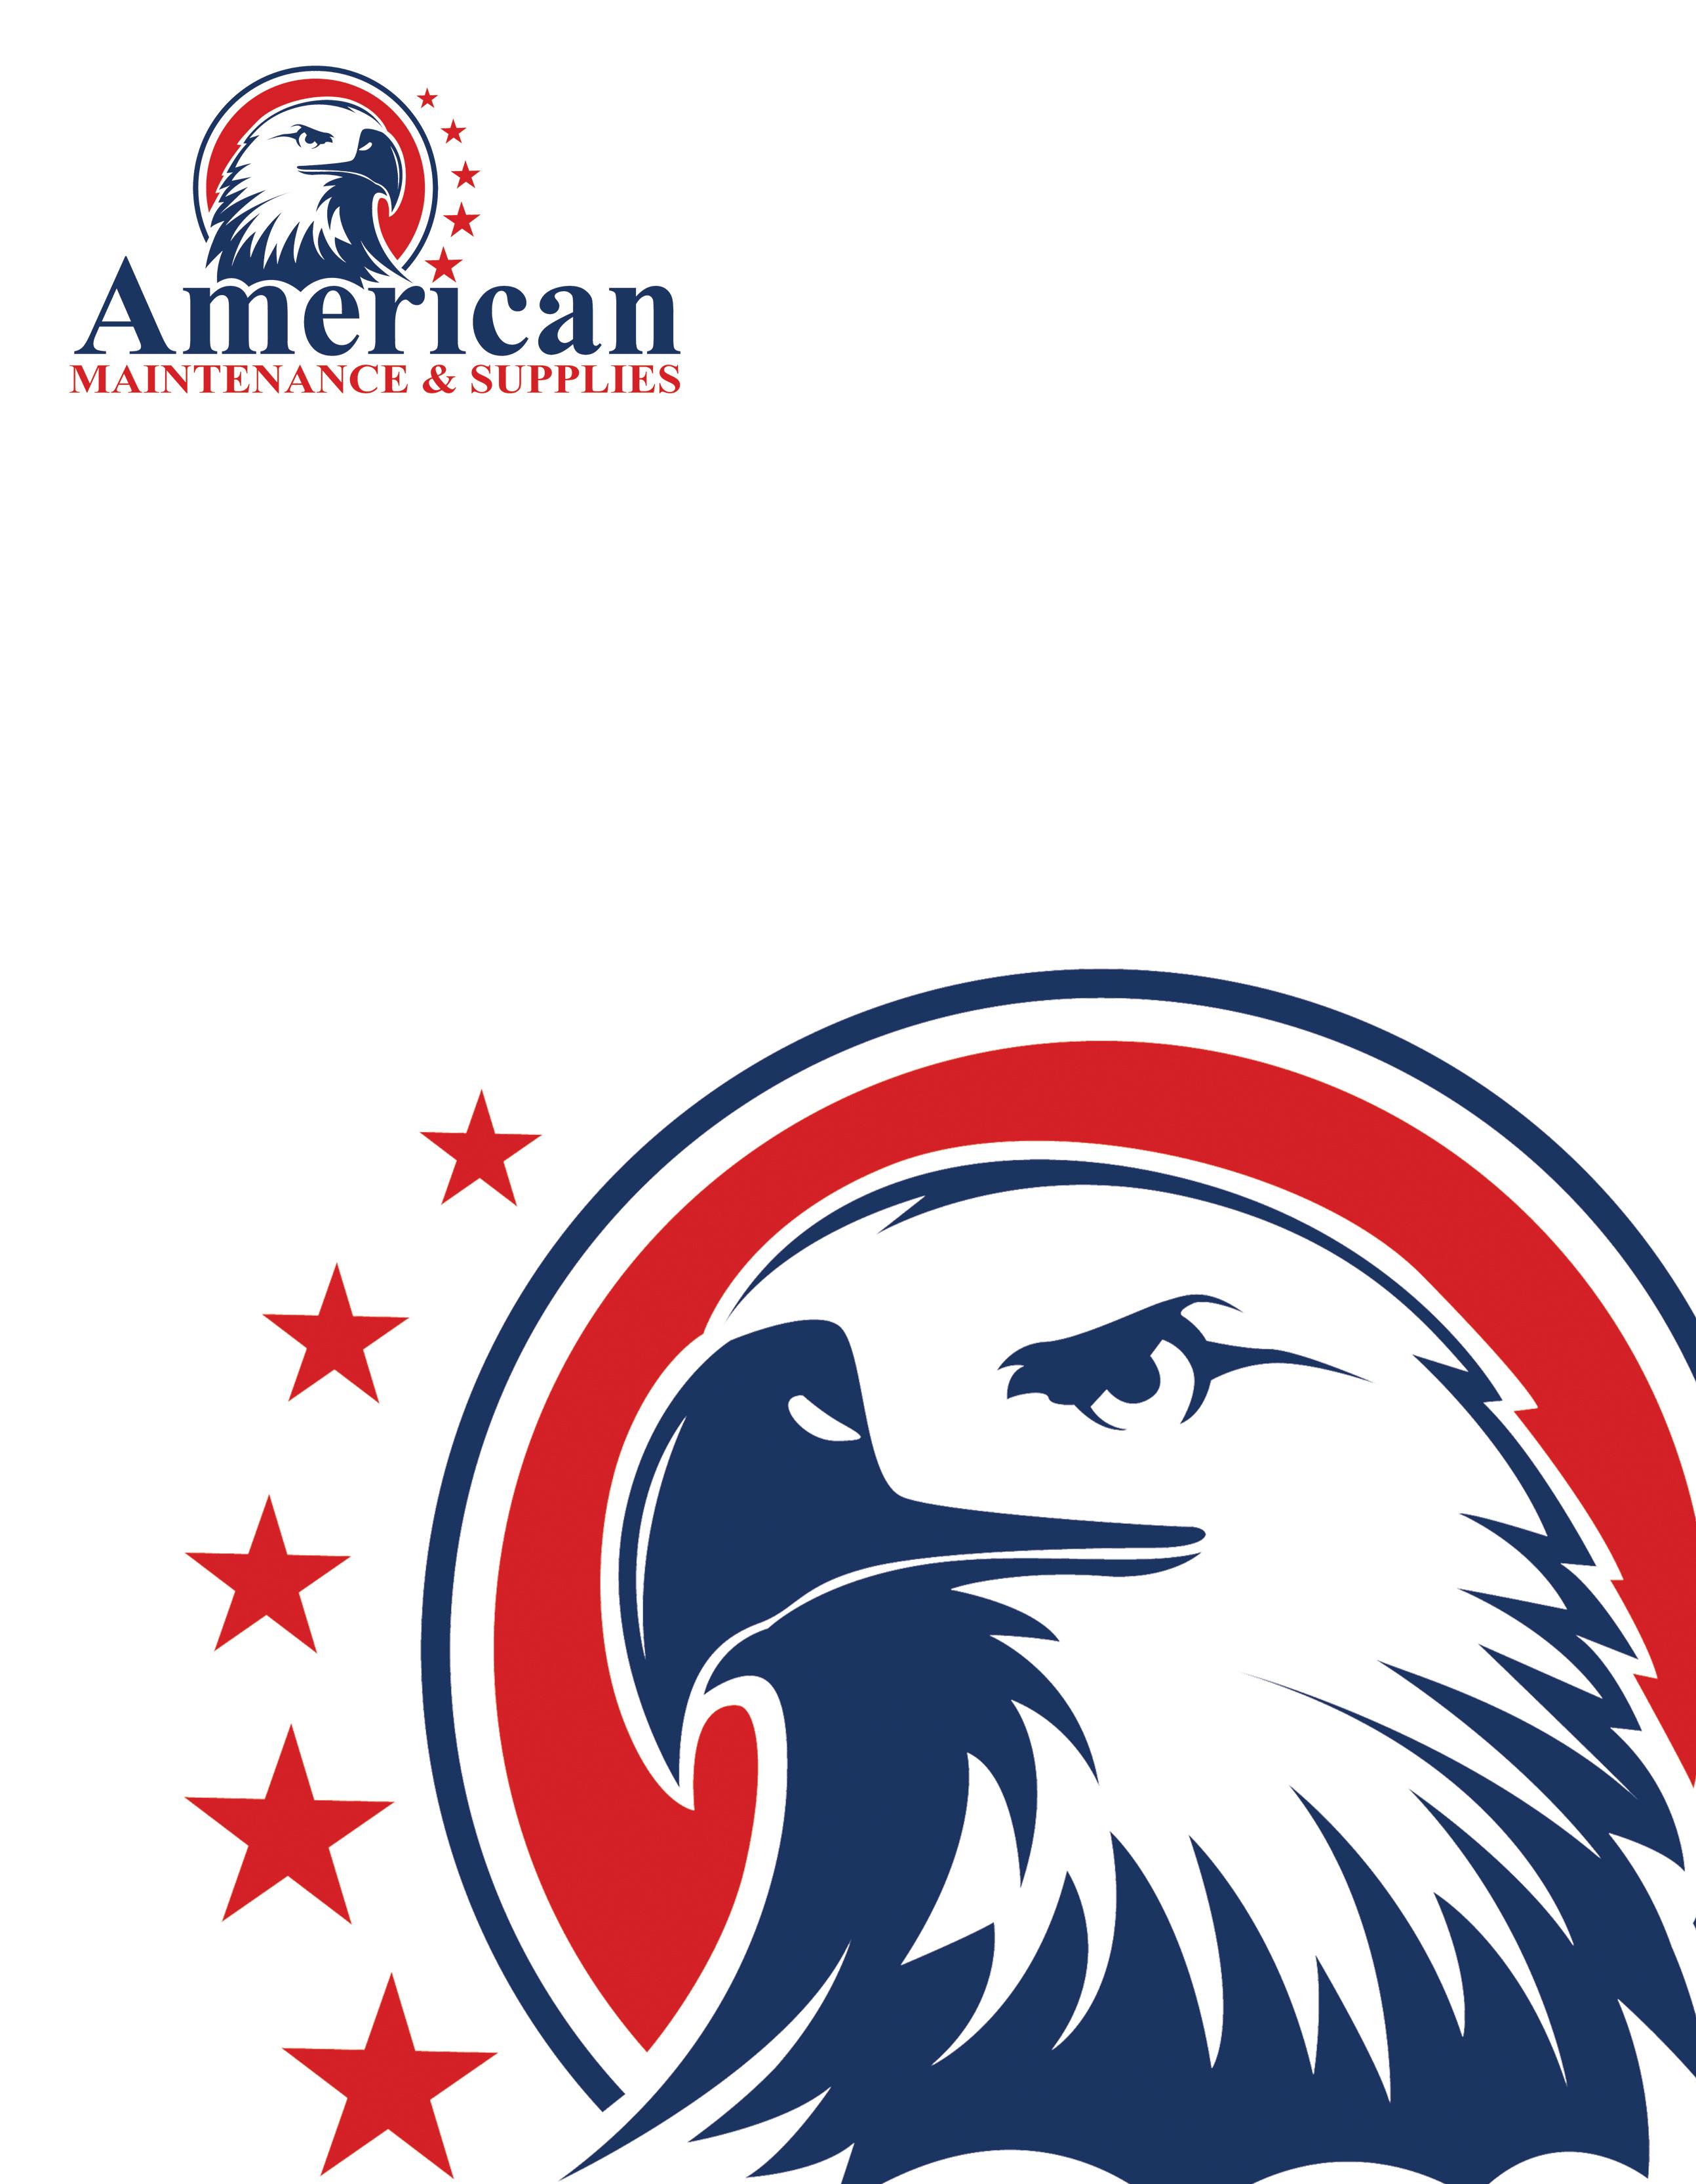 American Maintenance & Supplies, Inc. image 3